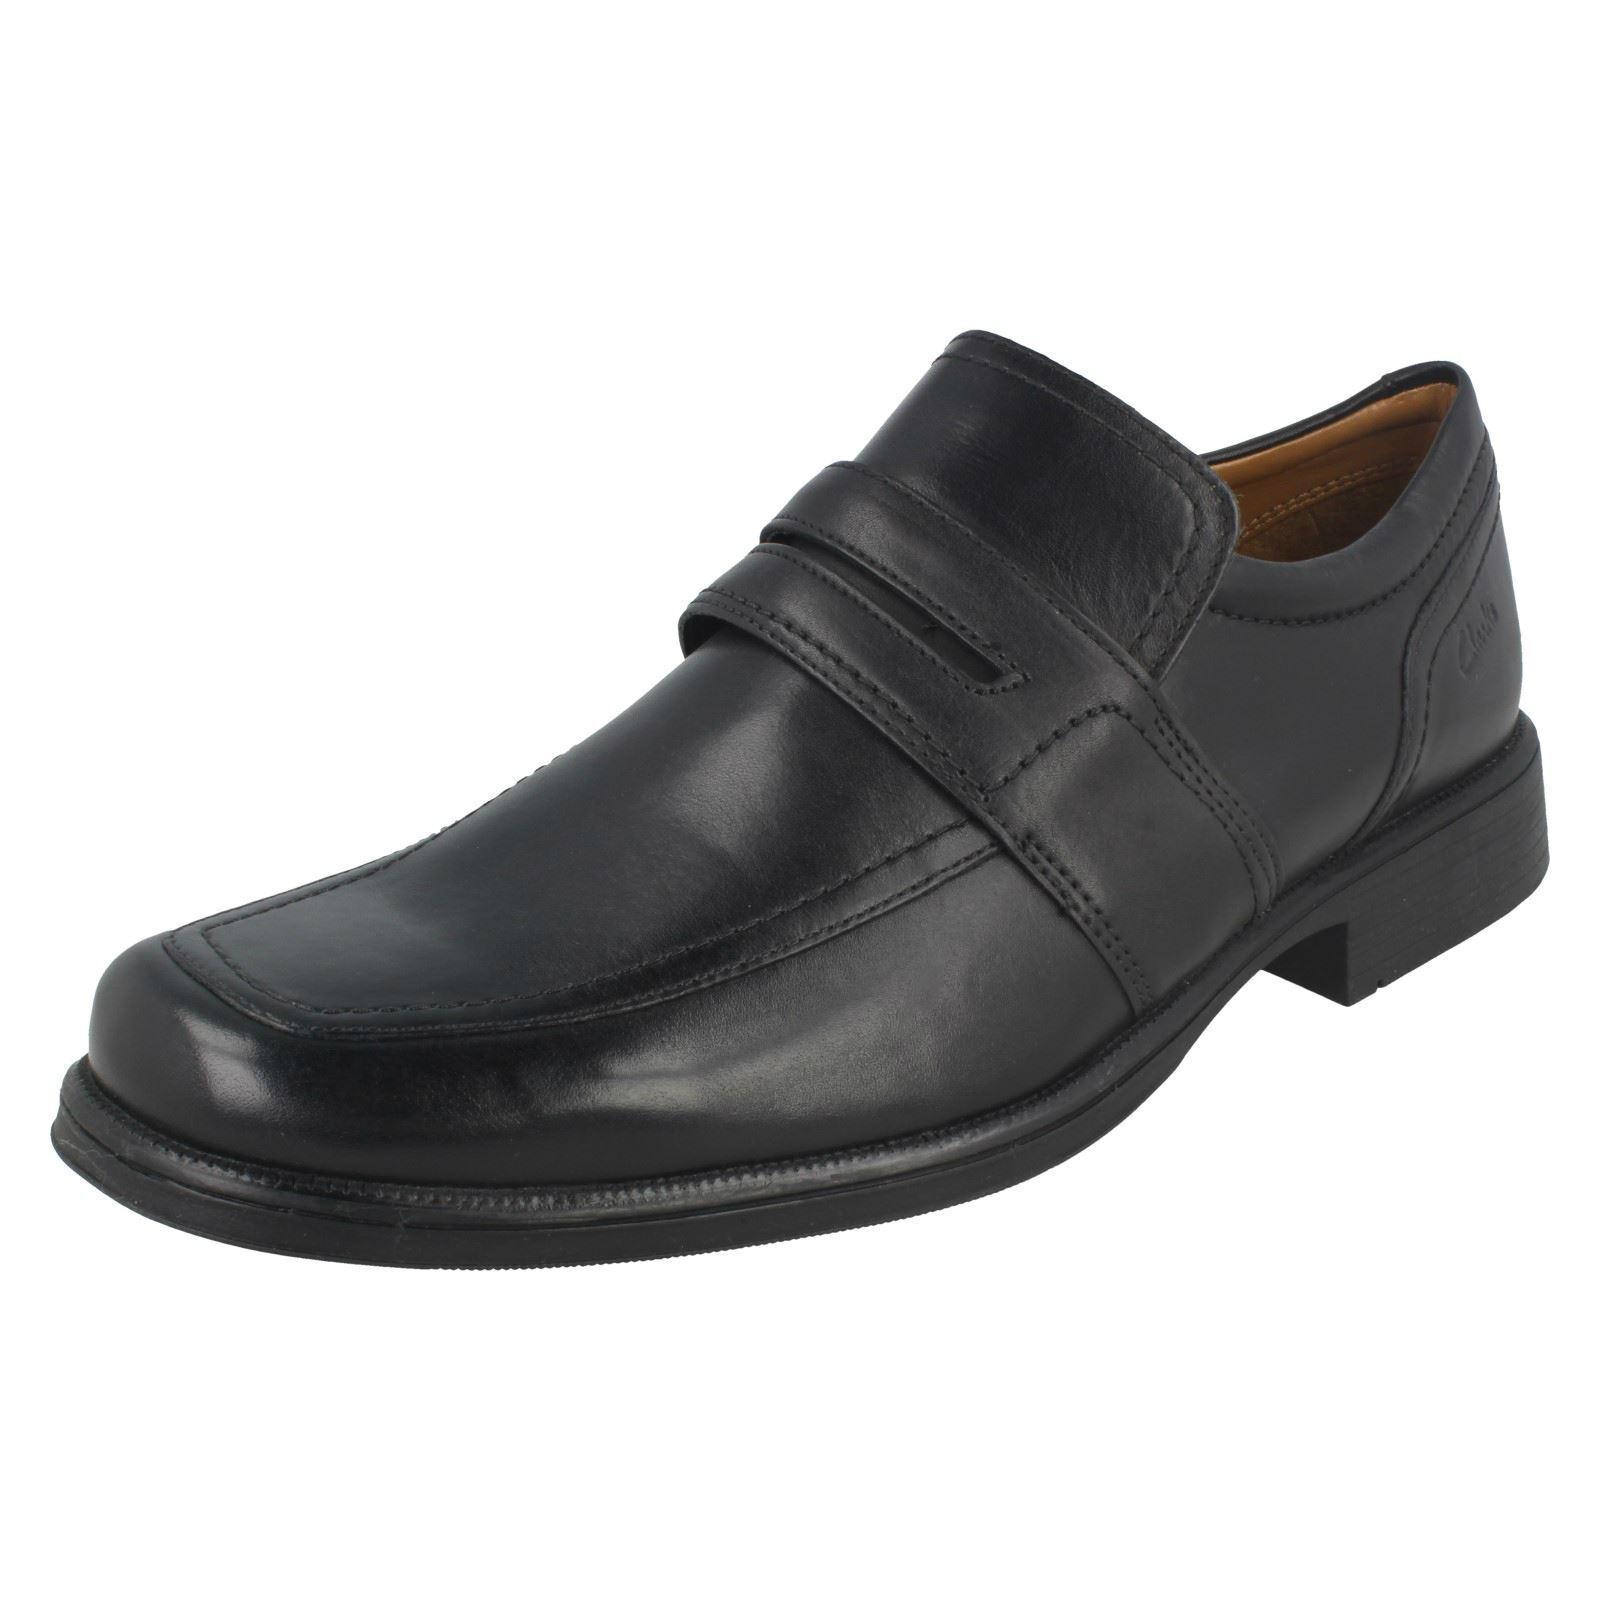 Gentlemen/Ladies Mens Clarks Formal Slip On and Shoes *Huckley Work* Modern and On elegant fashion Preferred material professional design BG1324 a7af30